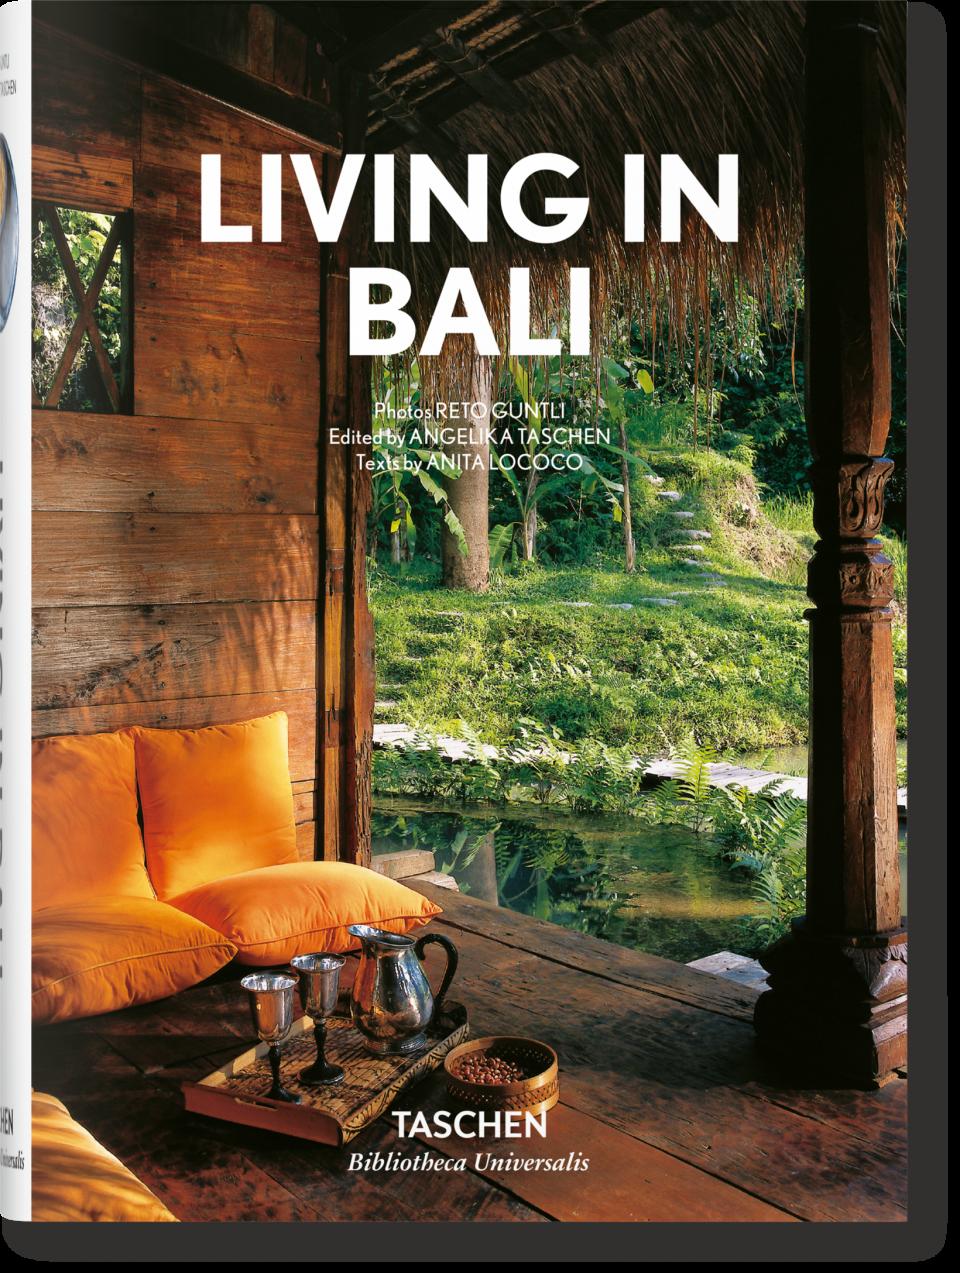 Living in Bali - Lococo Anita